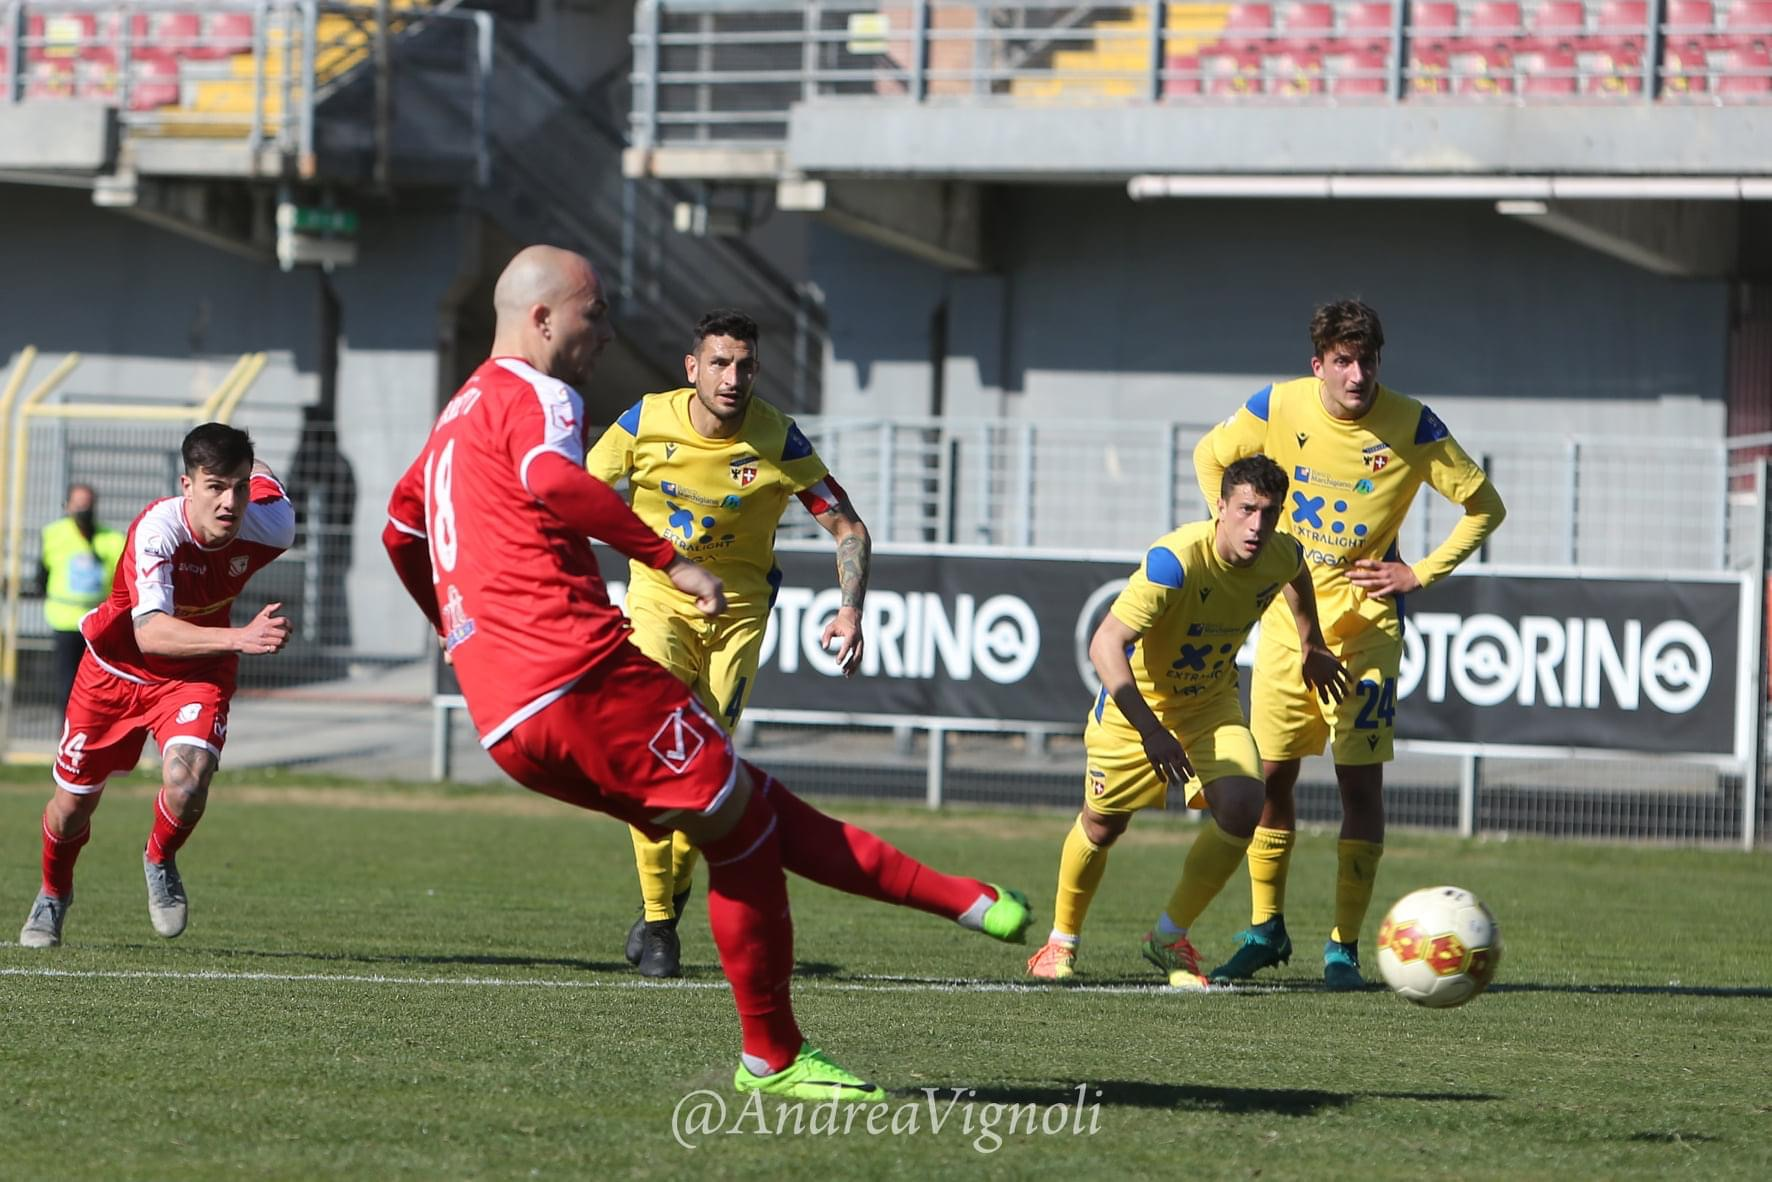 Carpi-Fermana 0-0, highlights